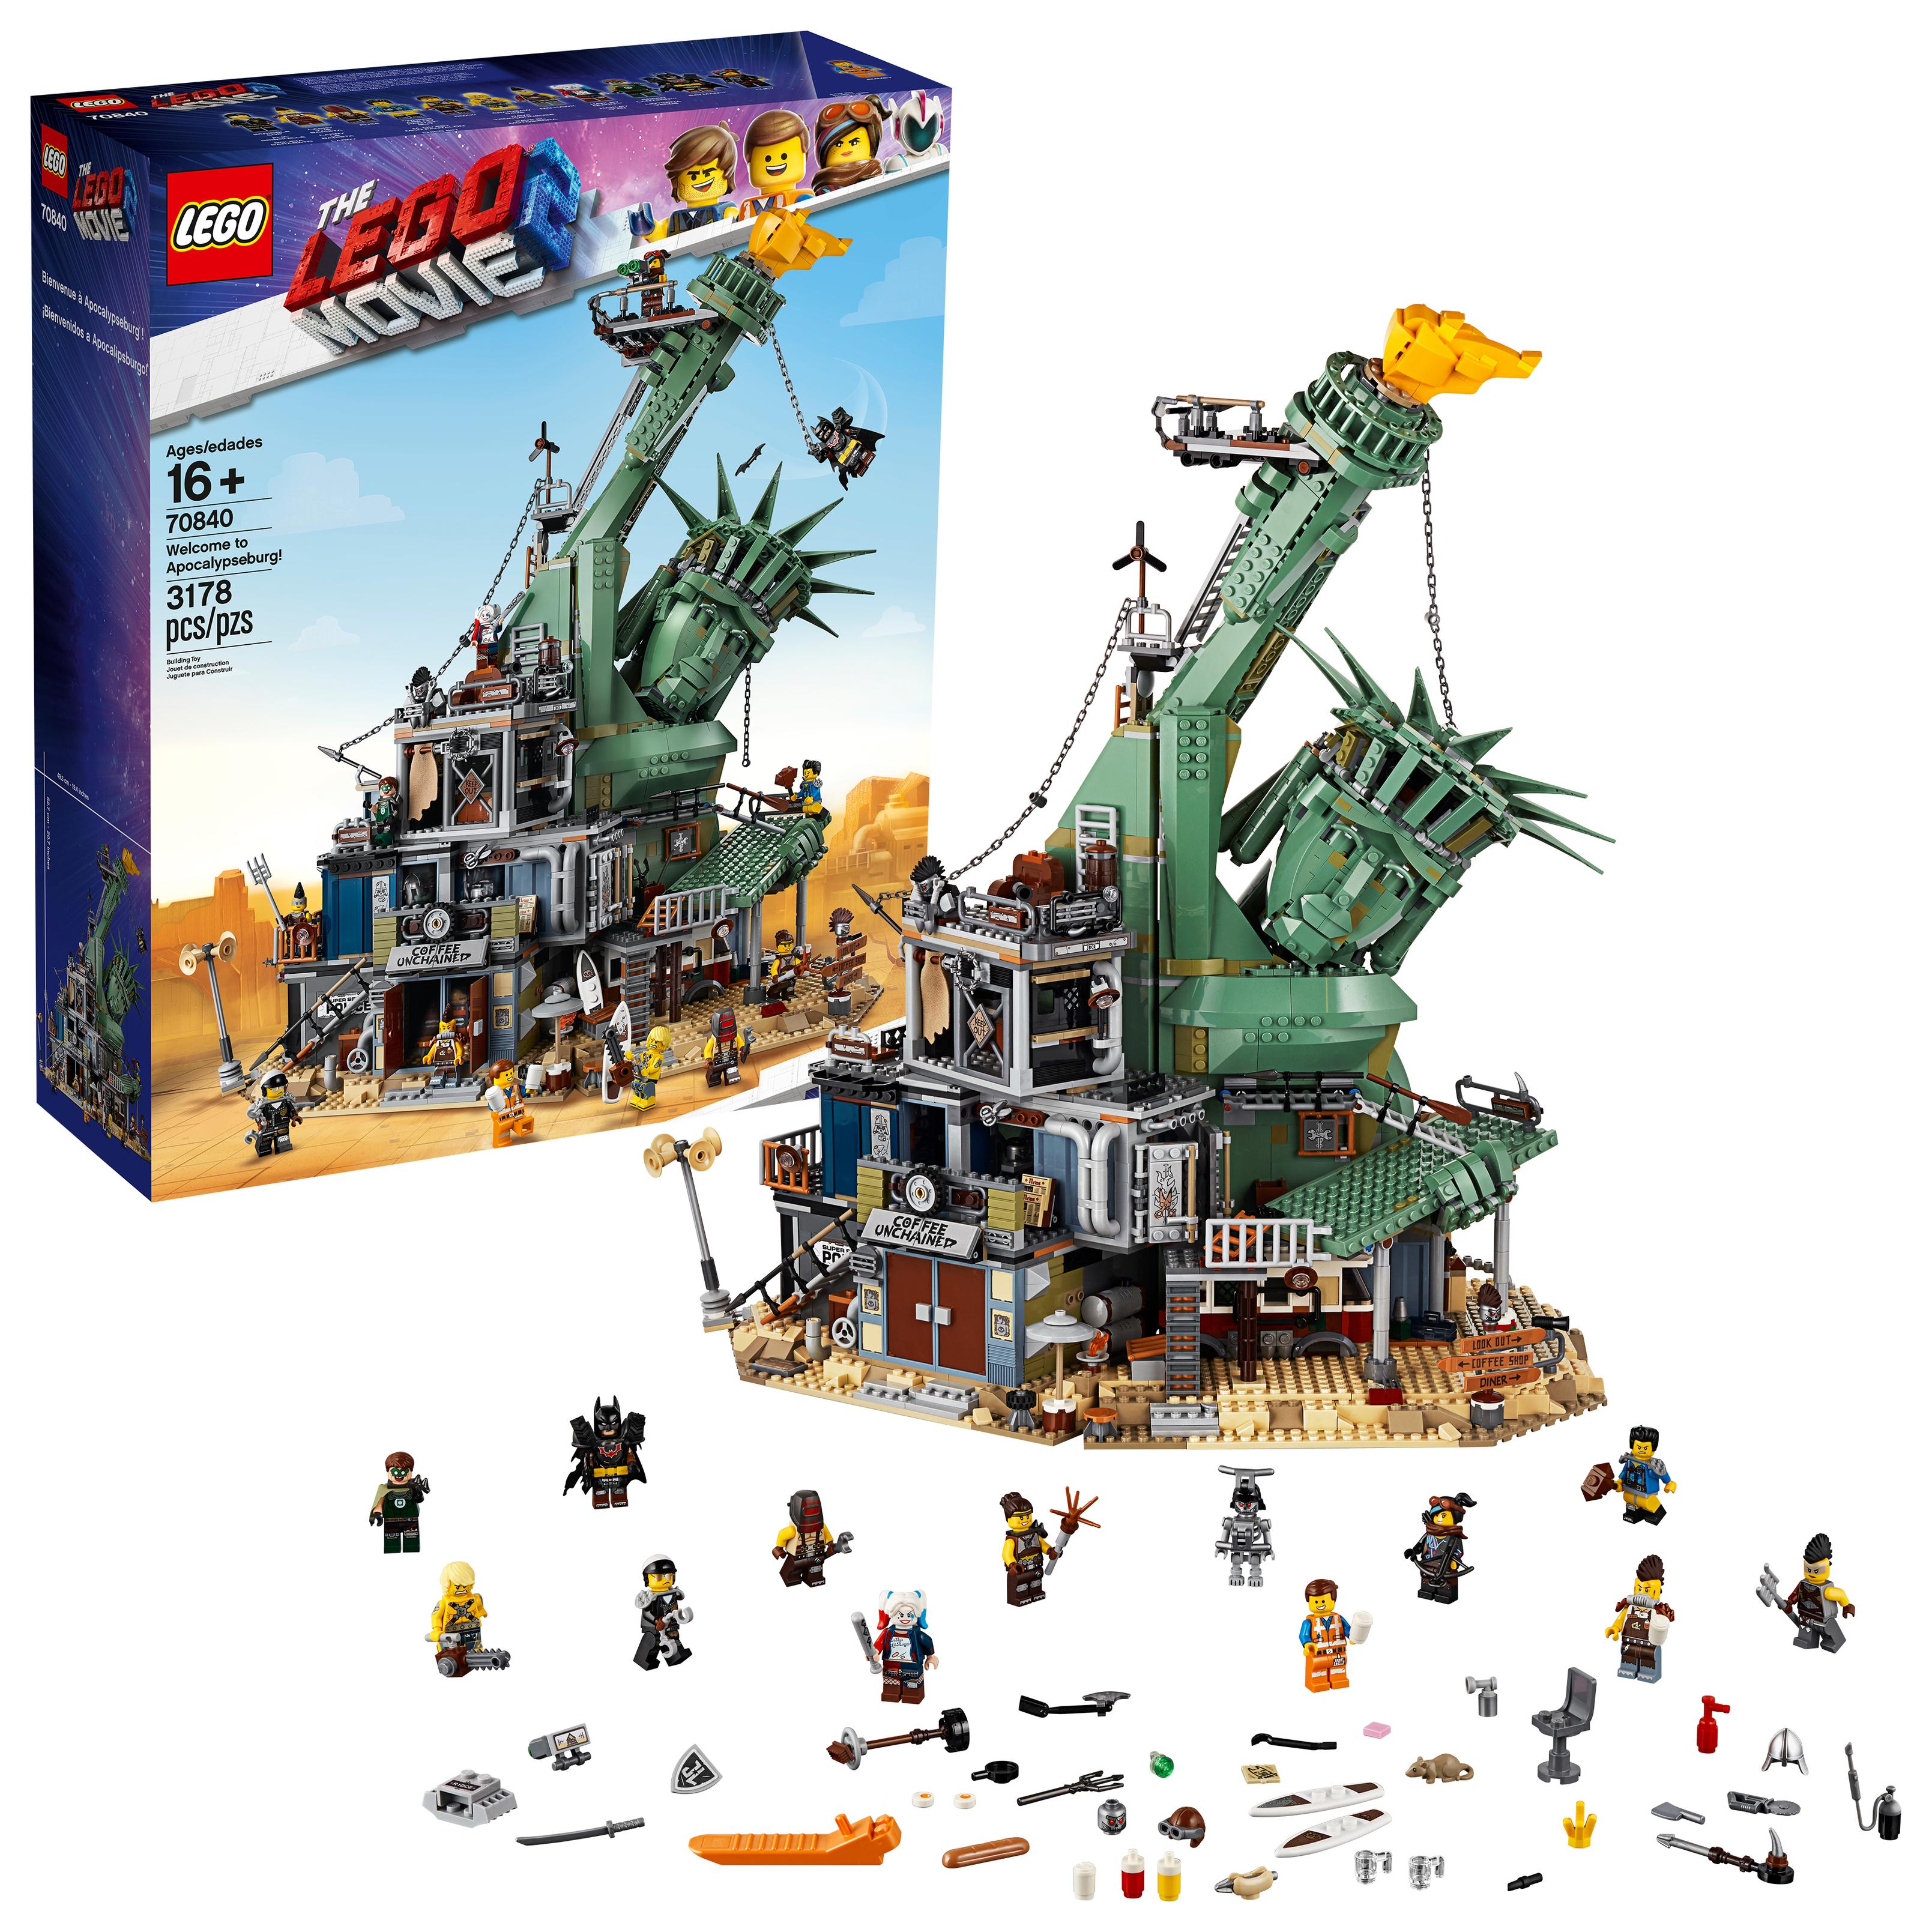 The LEGO 2 Movie Welcome to Apocalypseburg! 70840 $219.99